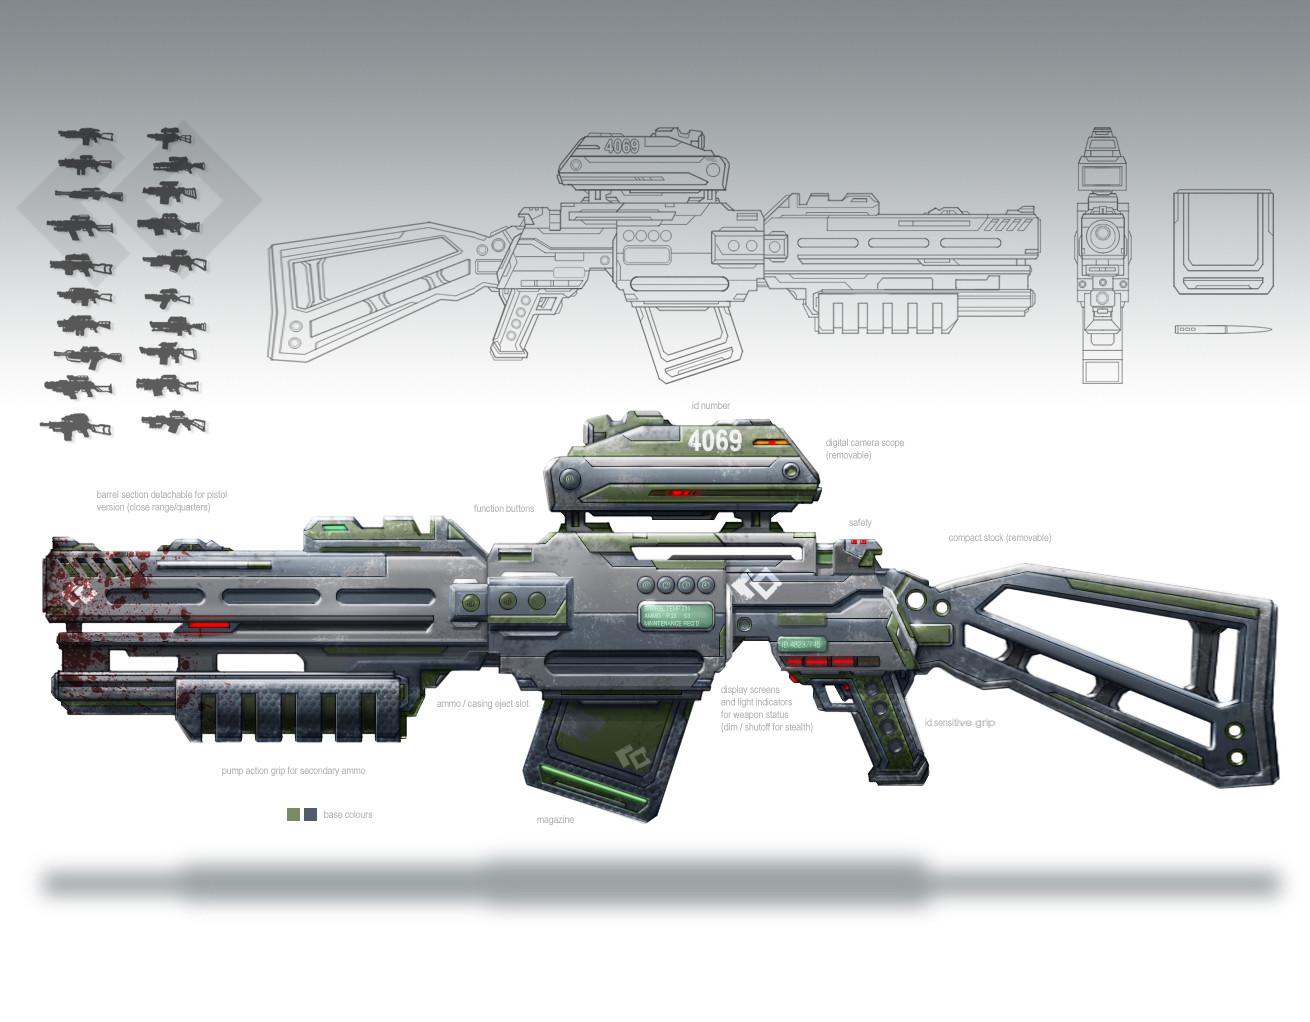 Sci Fi Assault Rifle